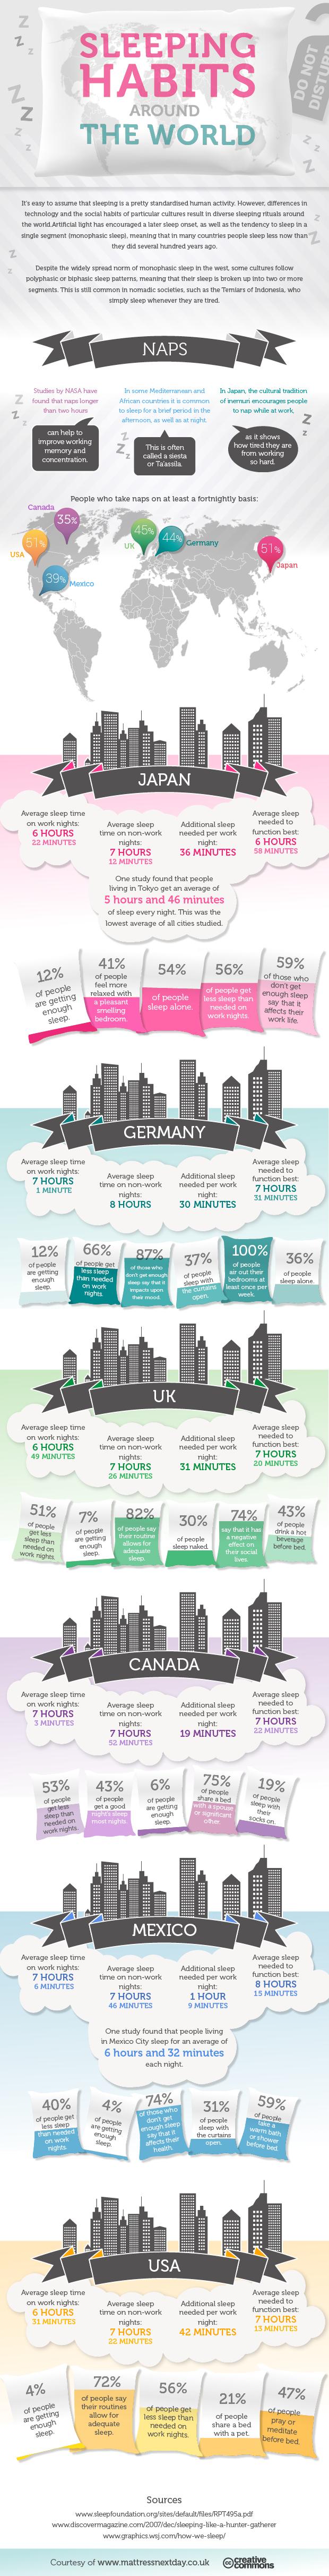 Sleeping Habits Around The World